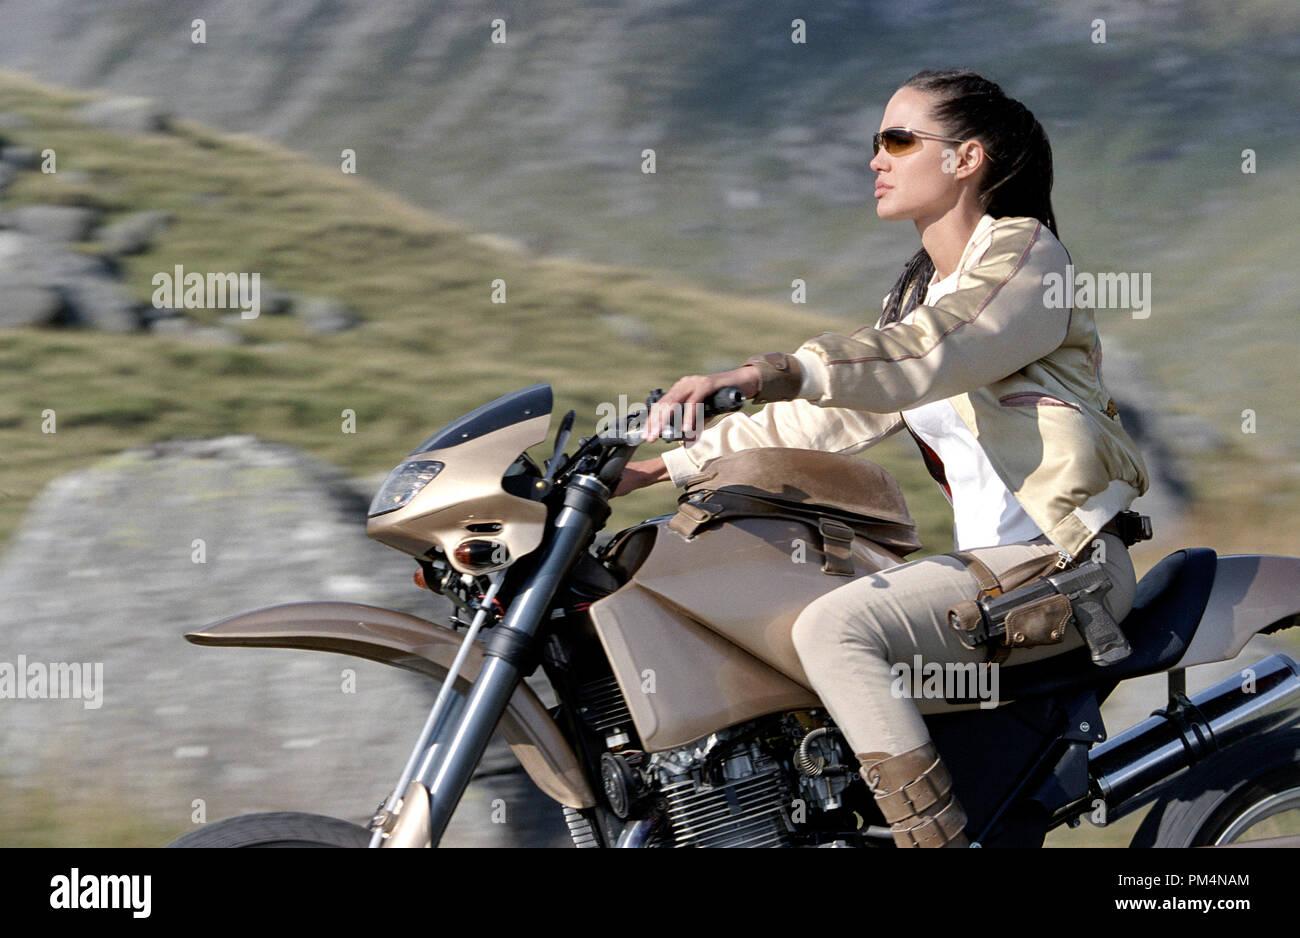 'Lara Croft Tomb Raider: The Cradle of Life' Angelina Jolie © 2003 Paramount - Stock Image